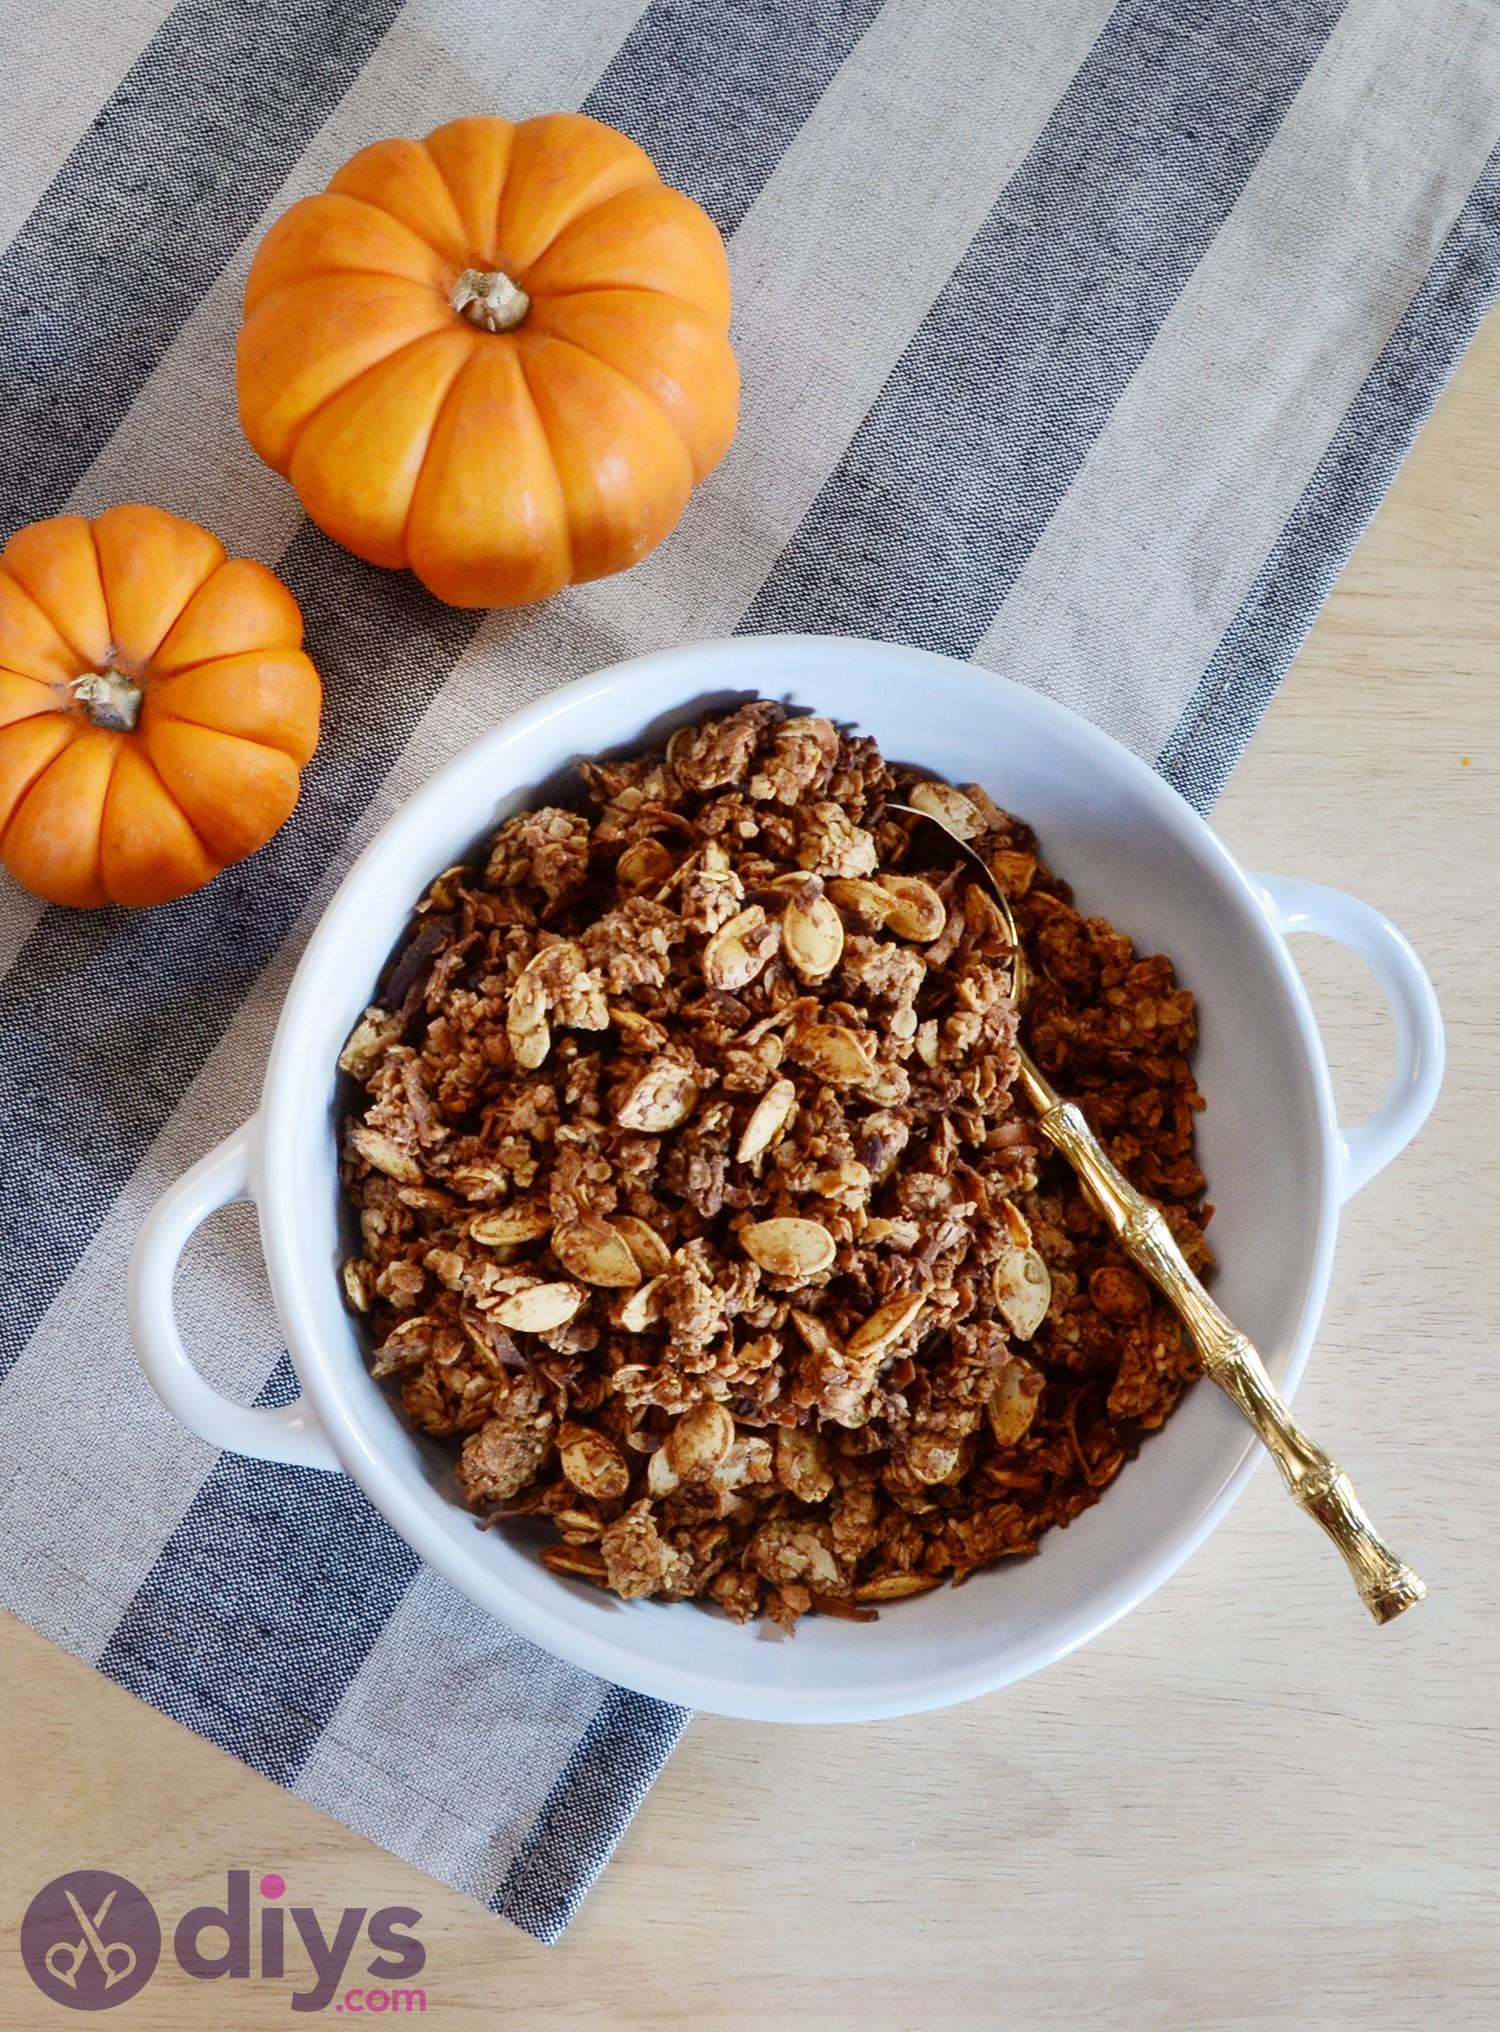 Pumpkin spice granola bars finger foods for halloween party